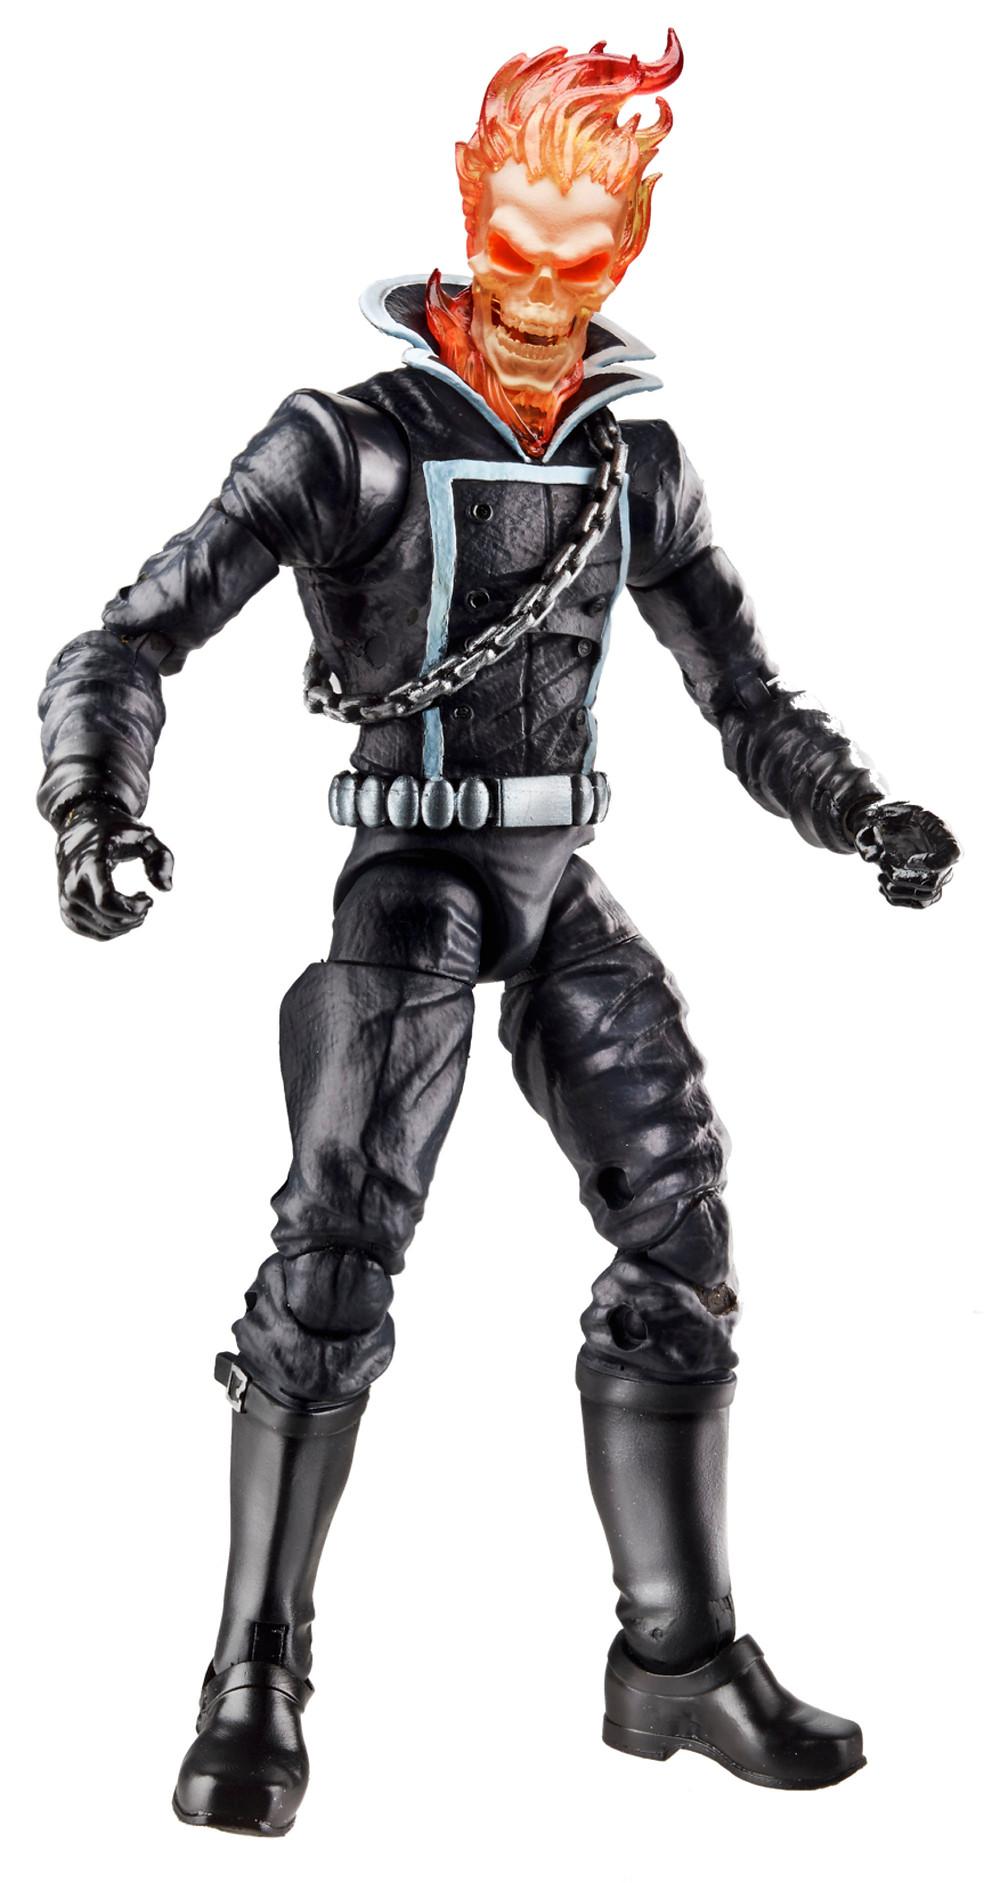 SpidermanLegends-Wave2-Ghost-Rider.jpg